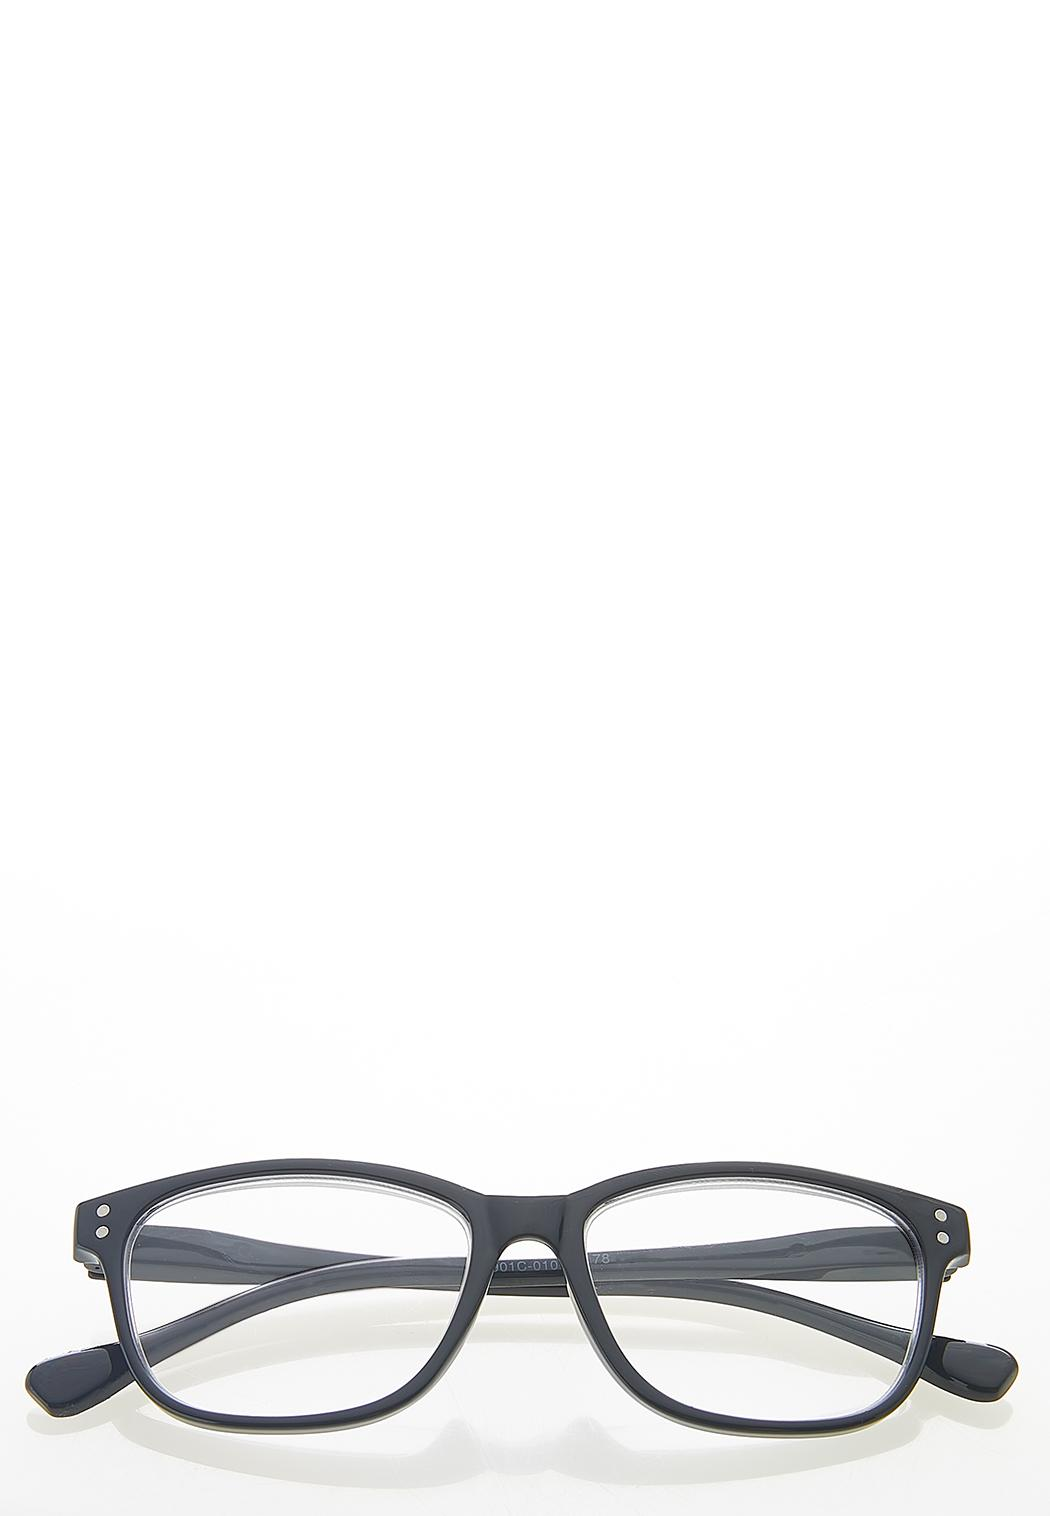 Classic Black Reader Glasses